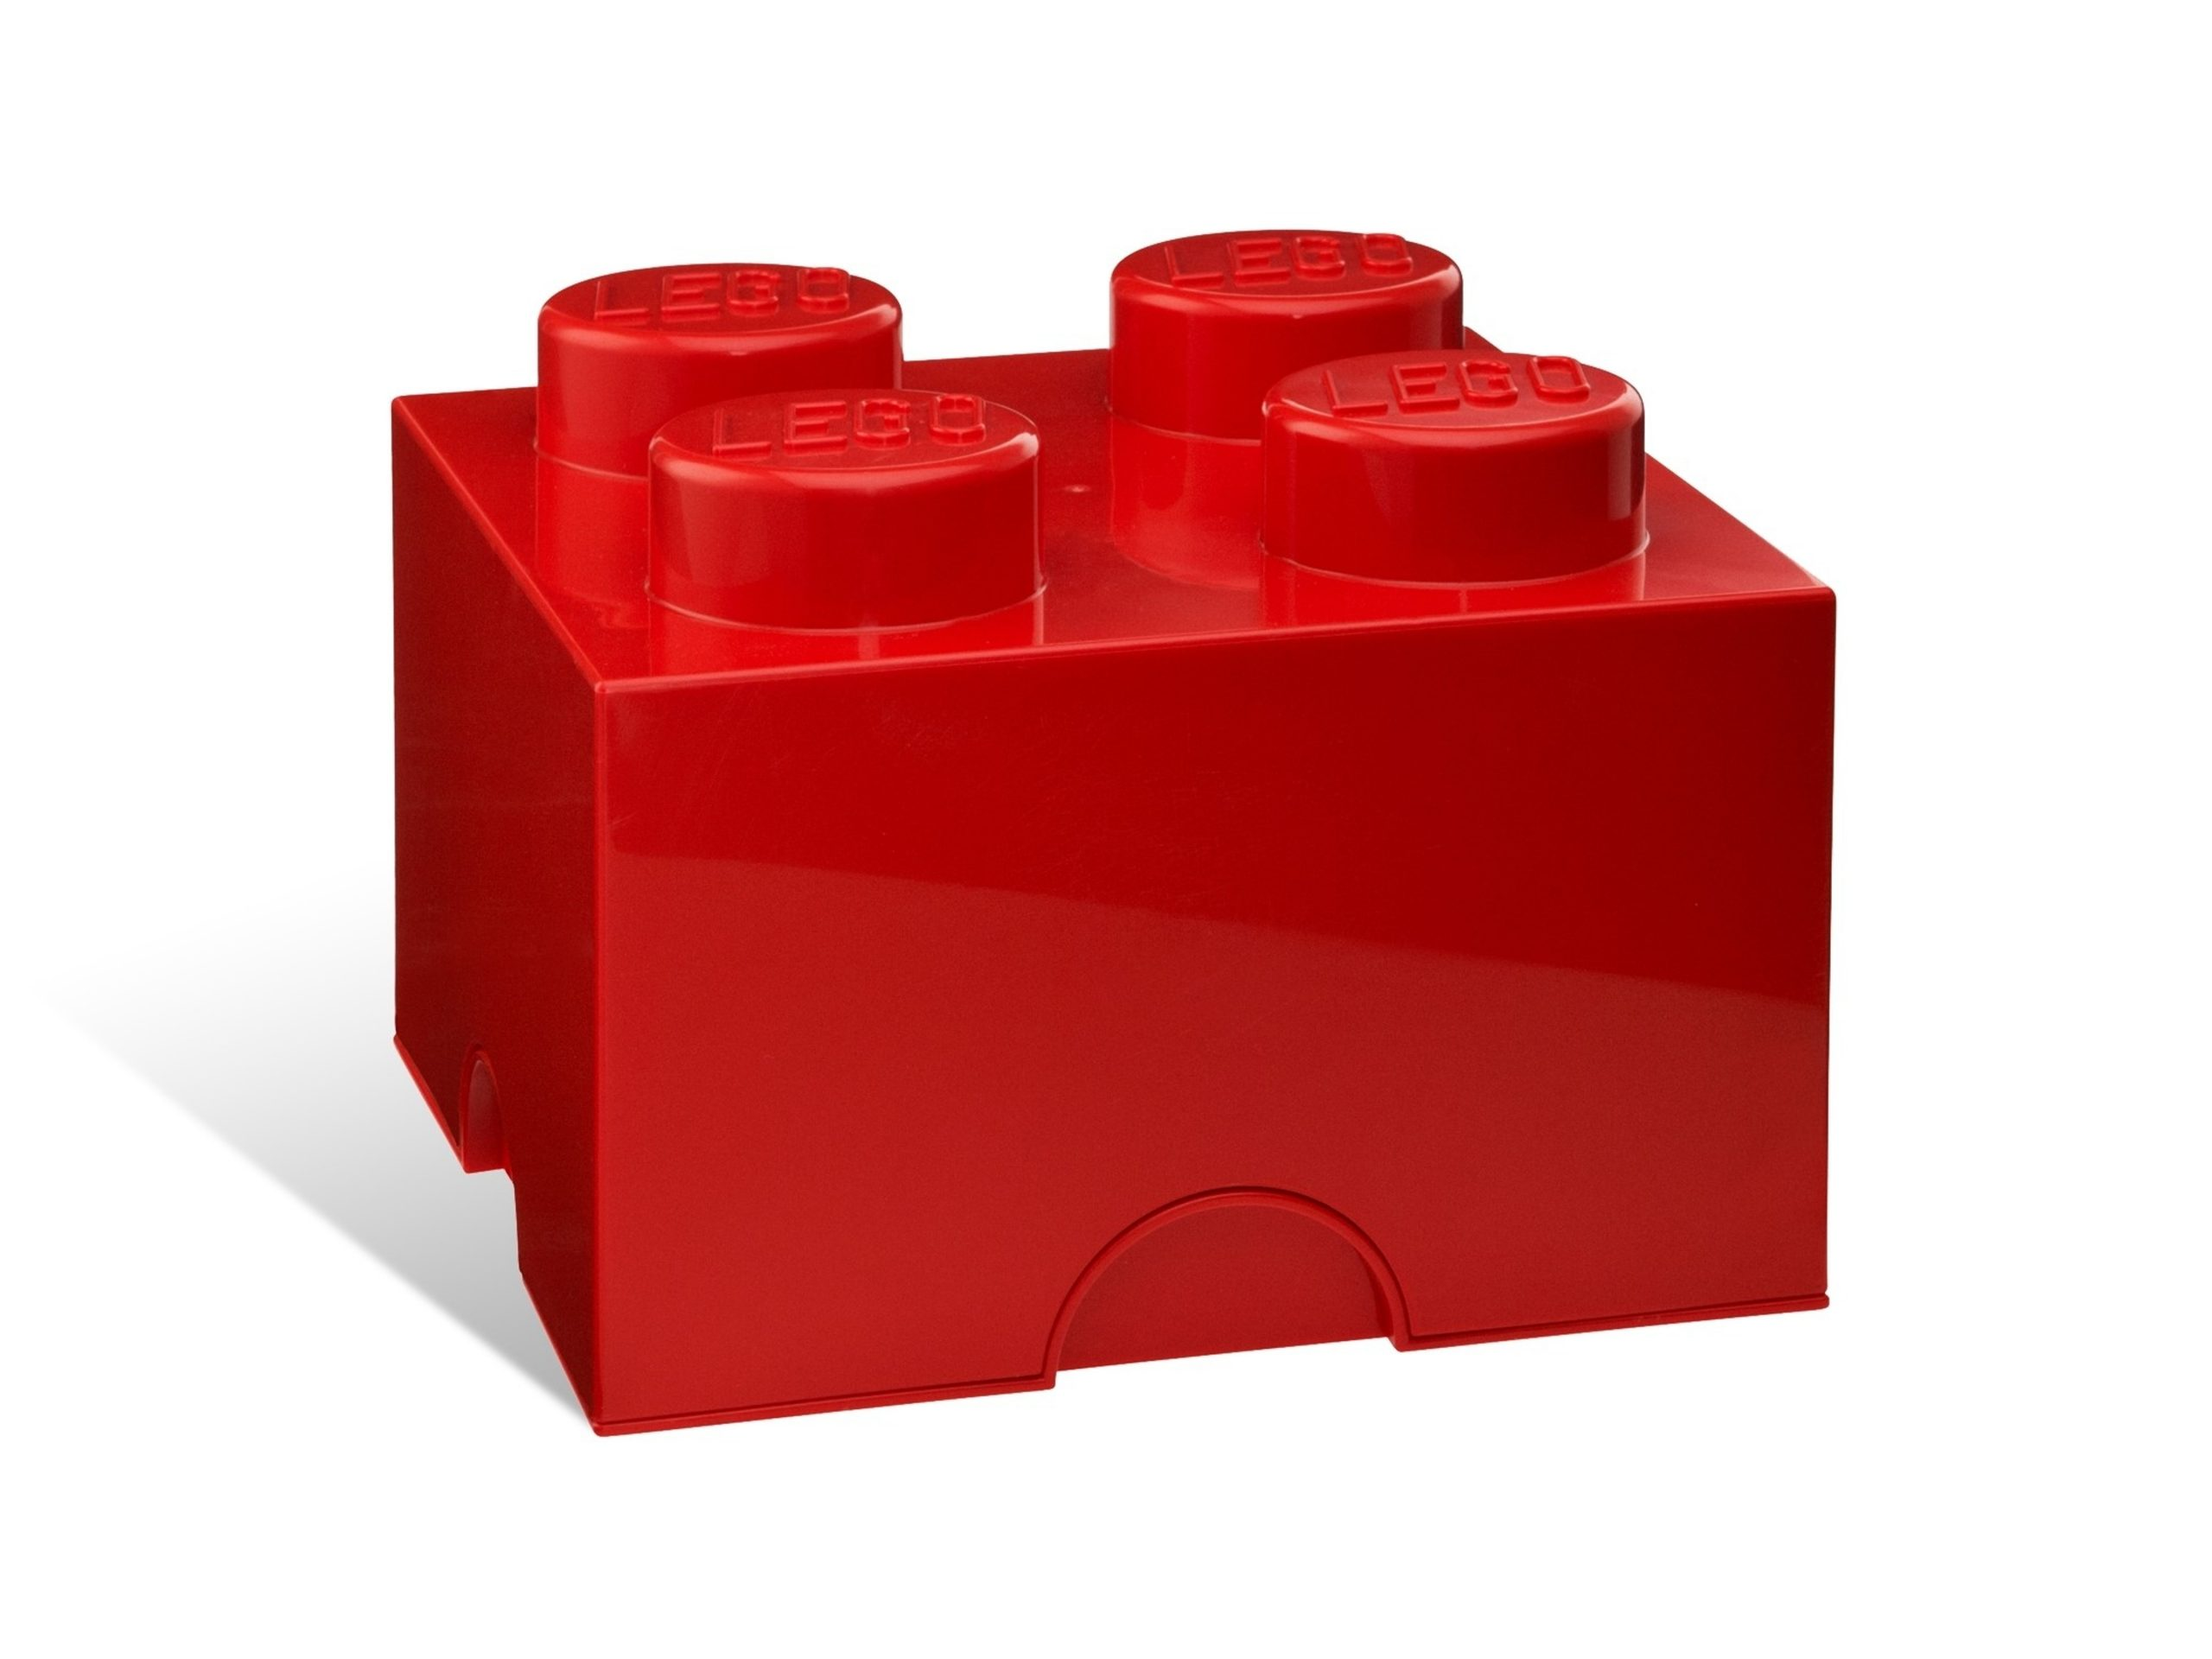 lego 5001385 4 stud red storage brick scaled